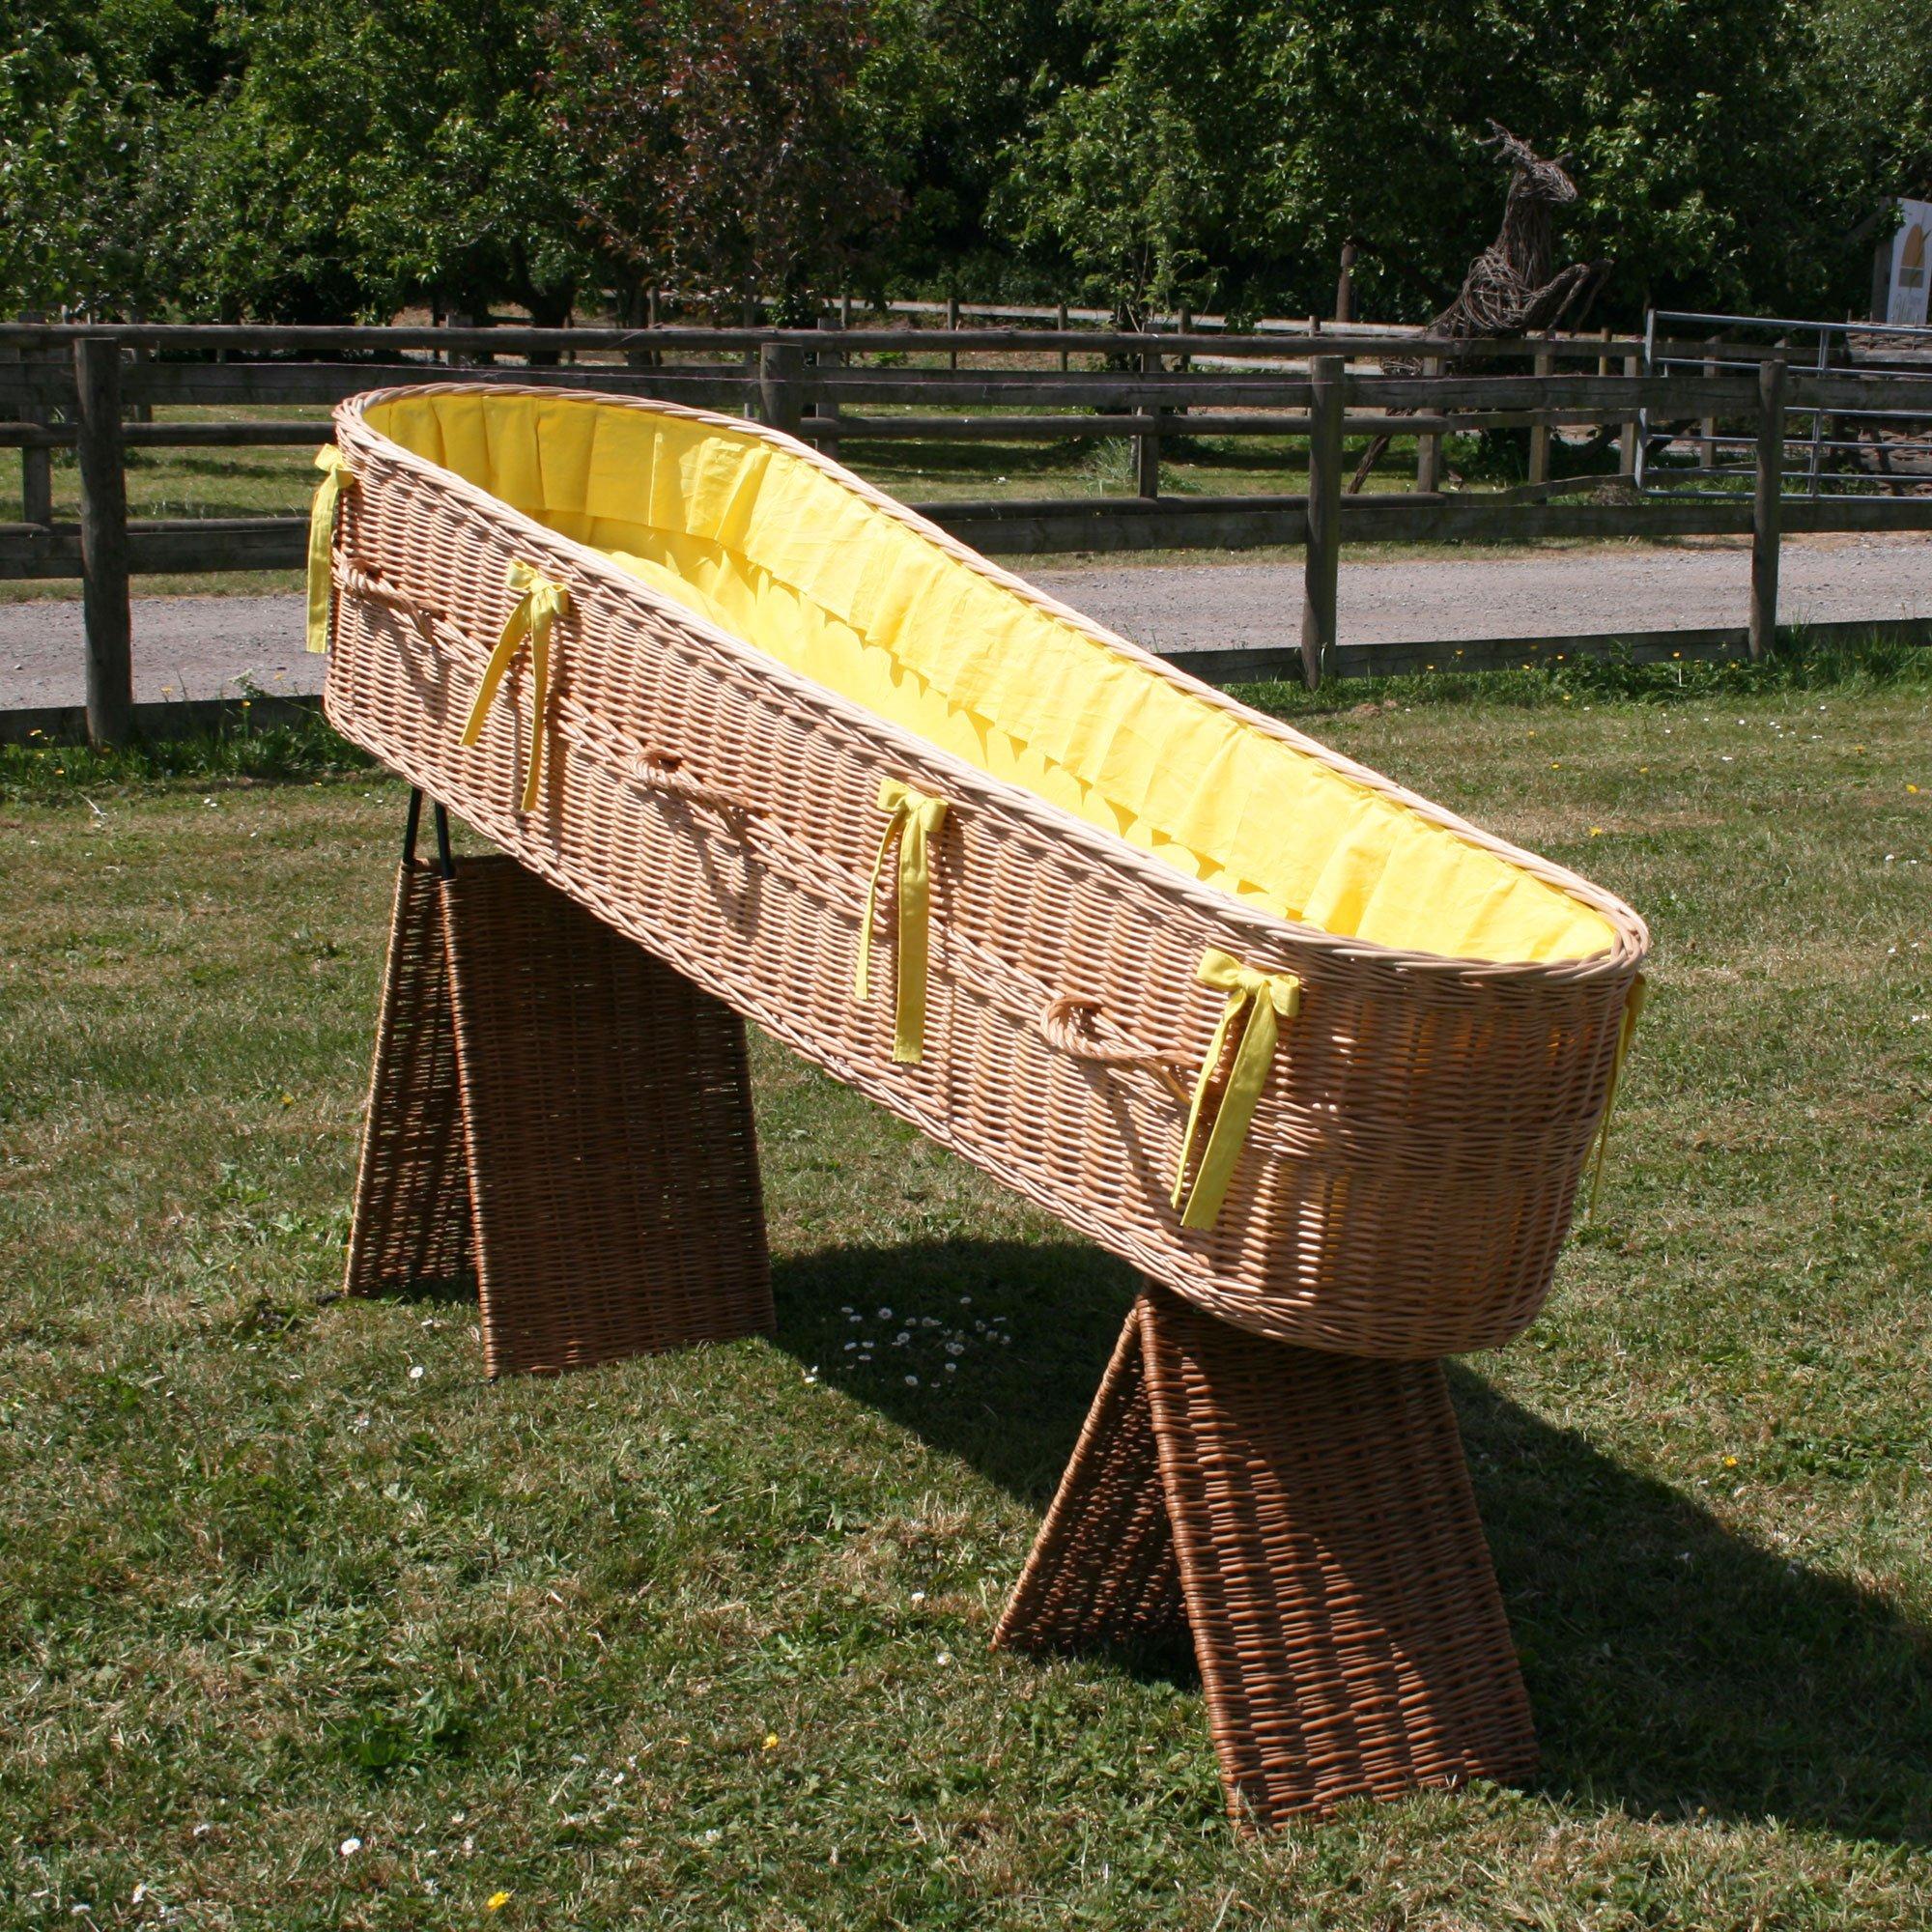 Yellow coffin lining